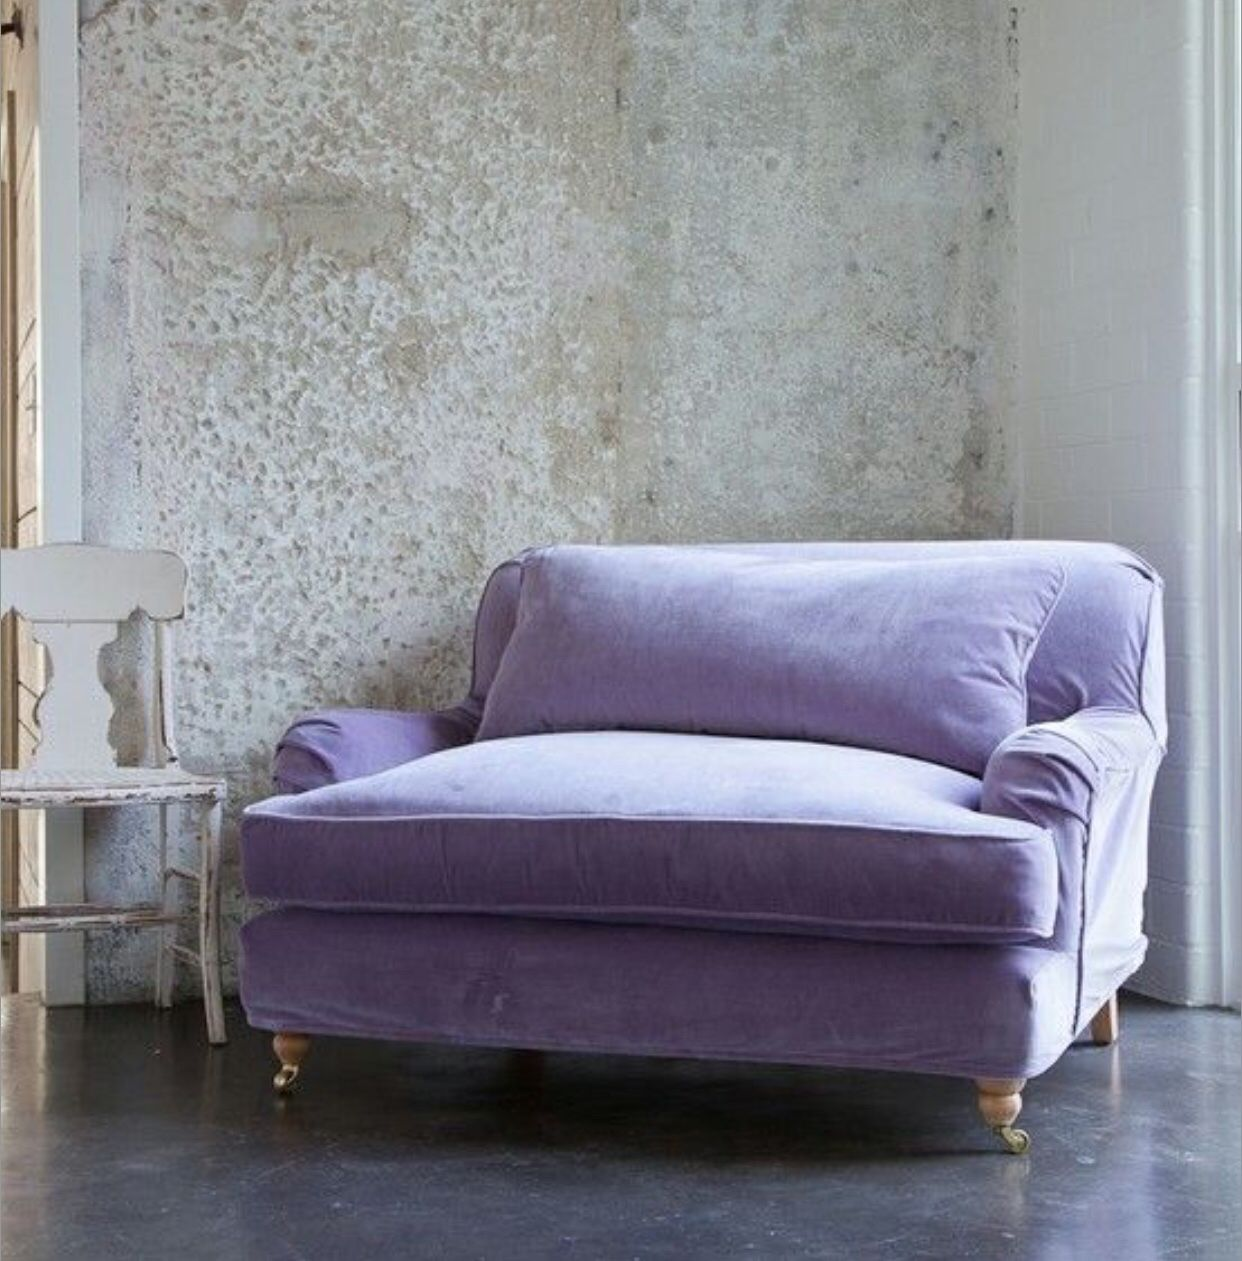 Lilac Loveseat Lavender Violet Purple Aubergine Velvet Sofa Couch Chair Gustavian